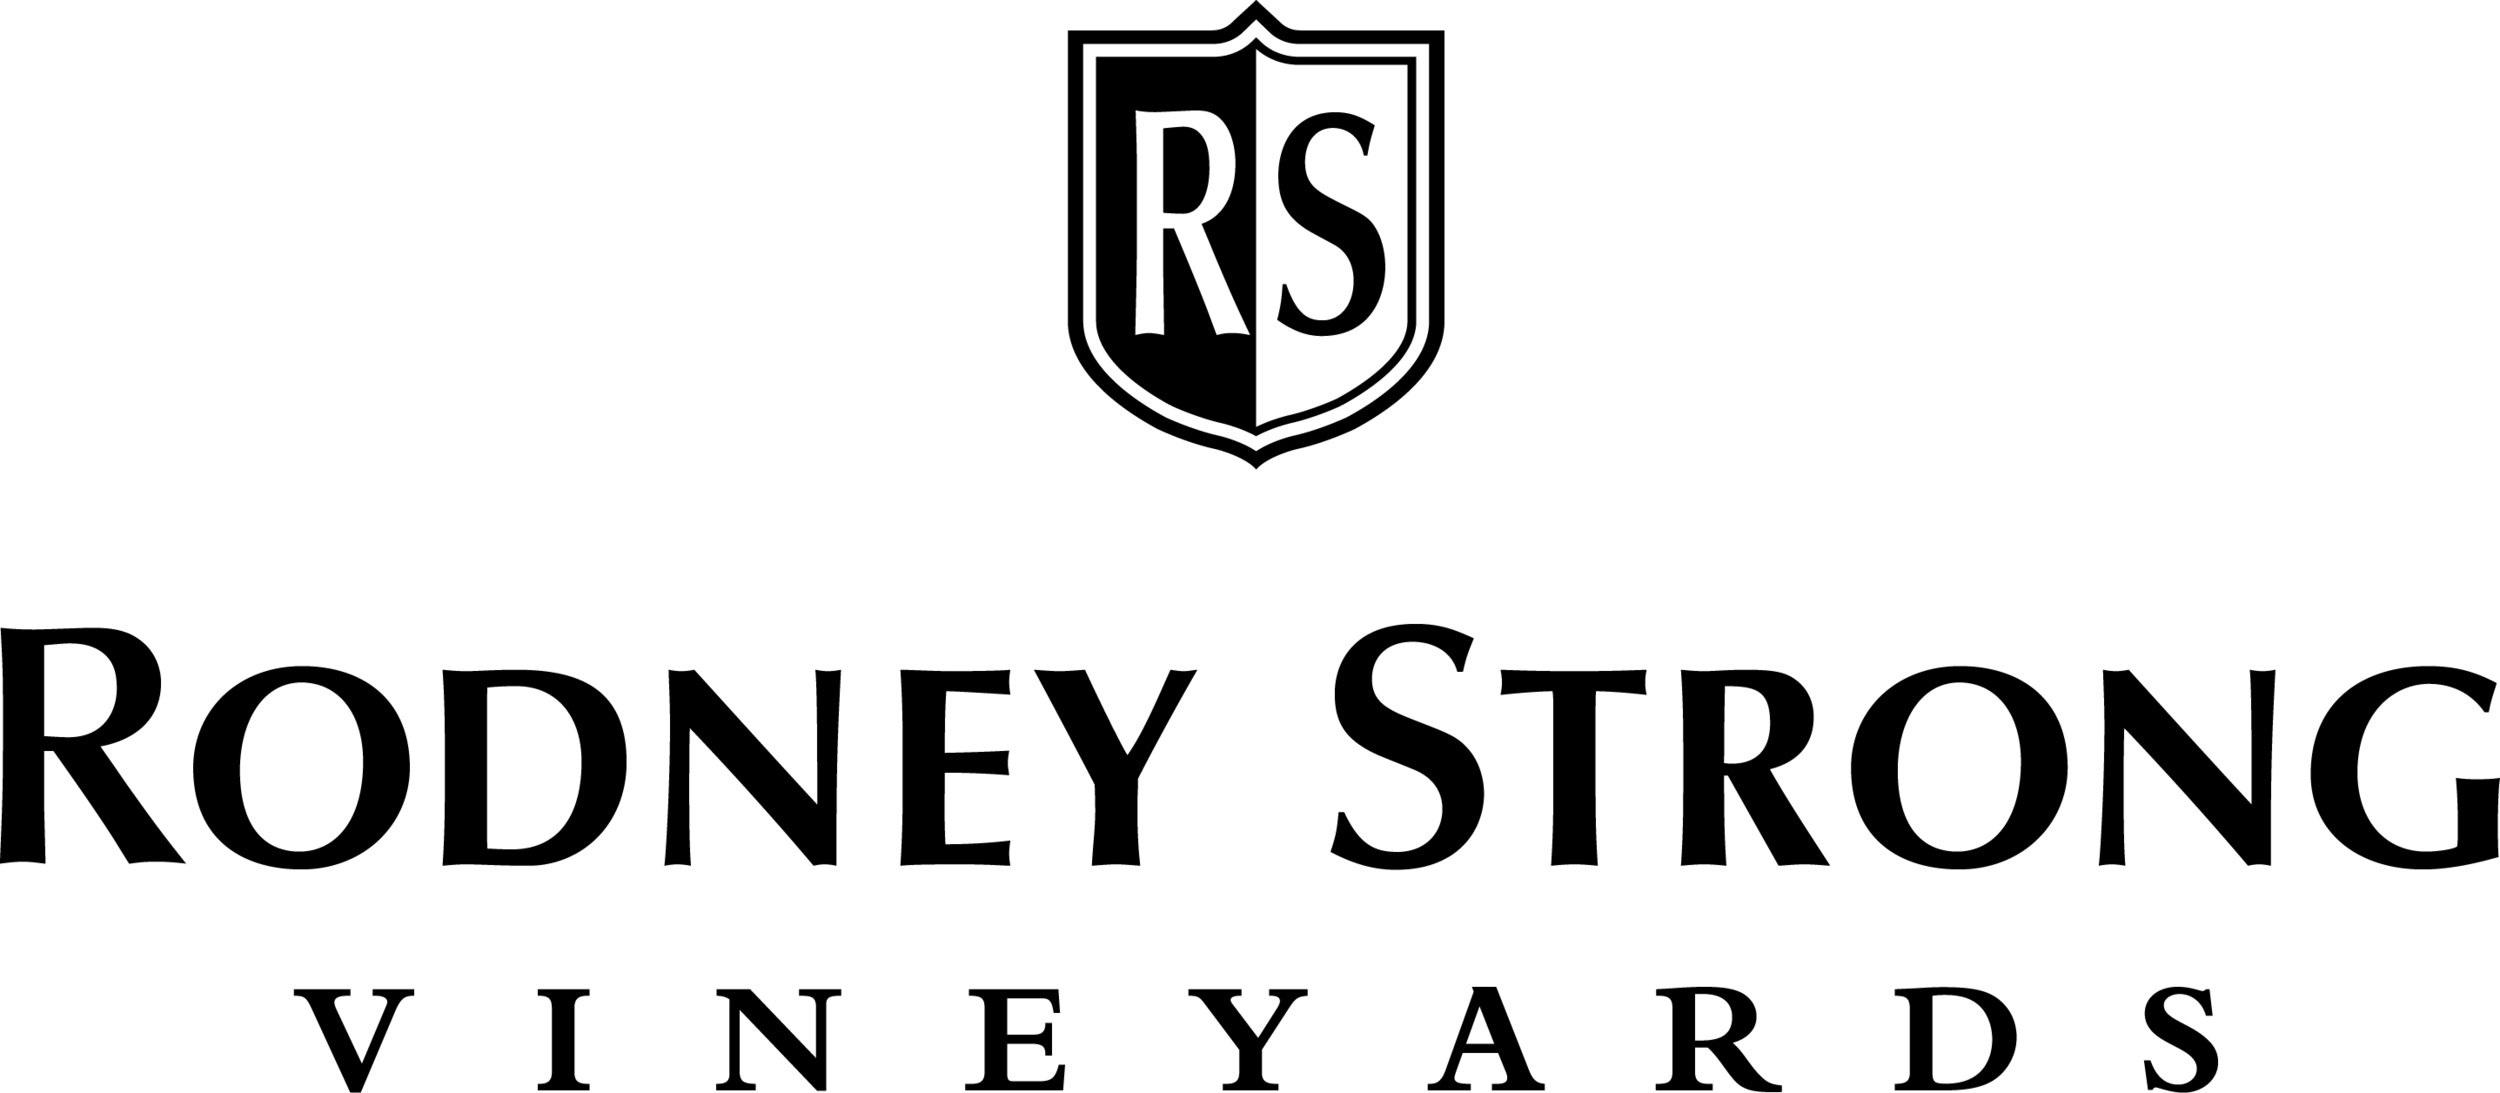 rodney-strong-logo-crest-300dpi.jpg